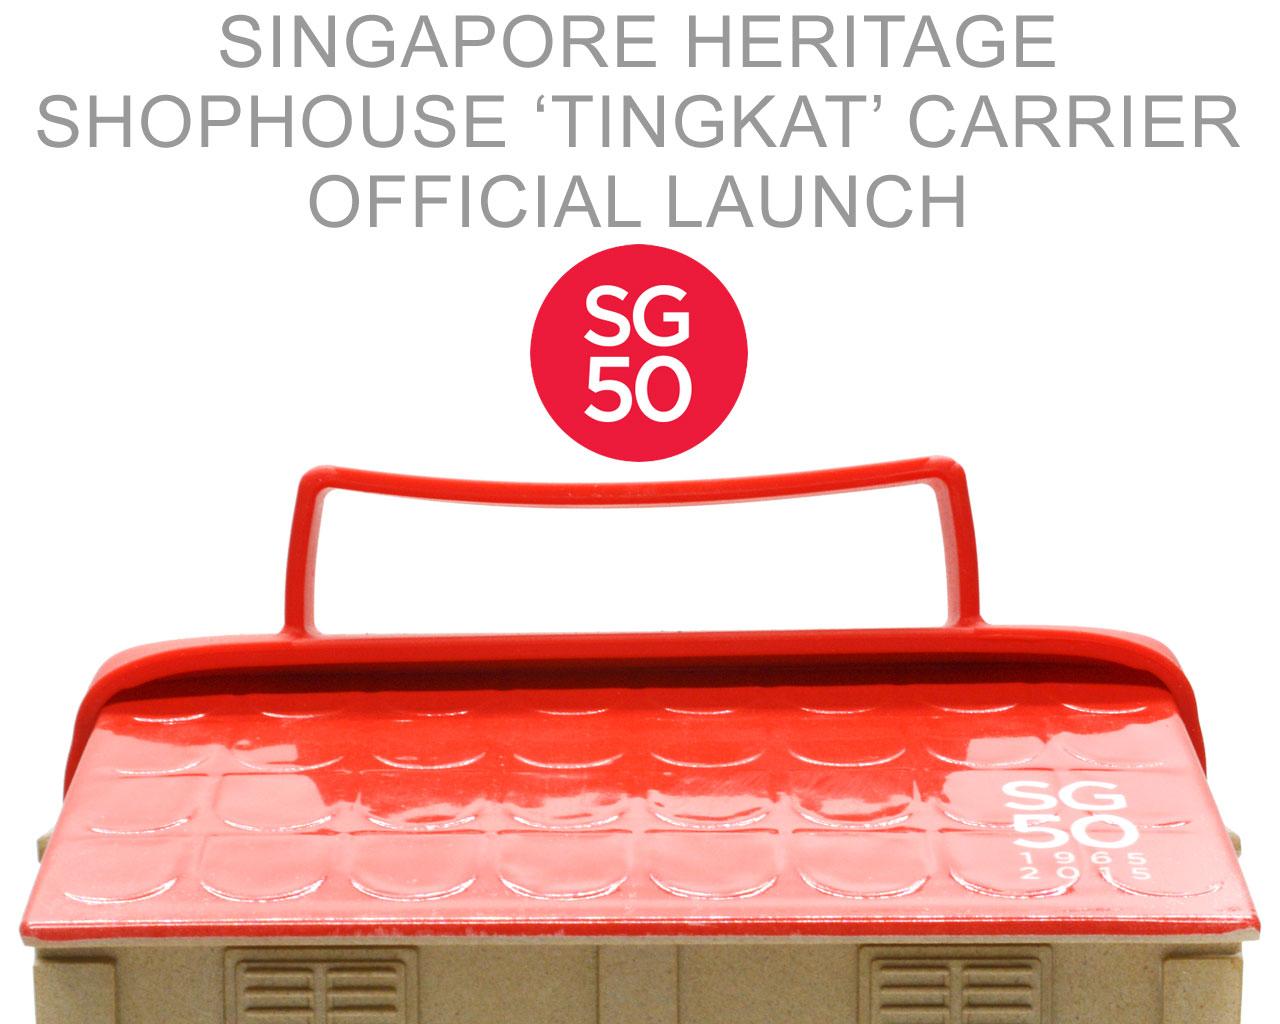 Singapore tingkat featured image